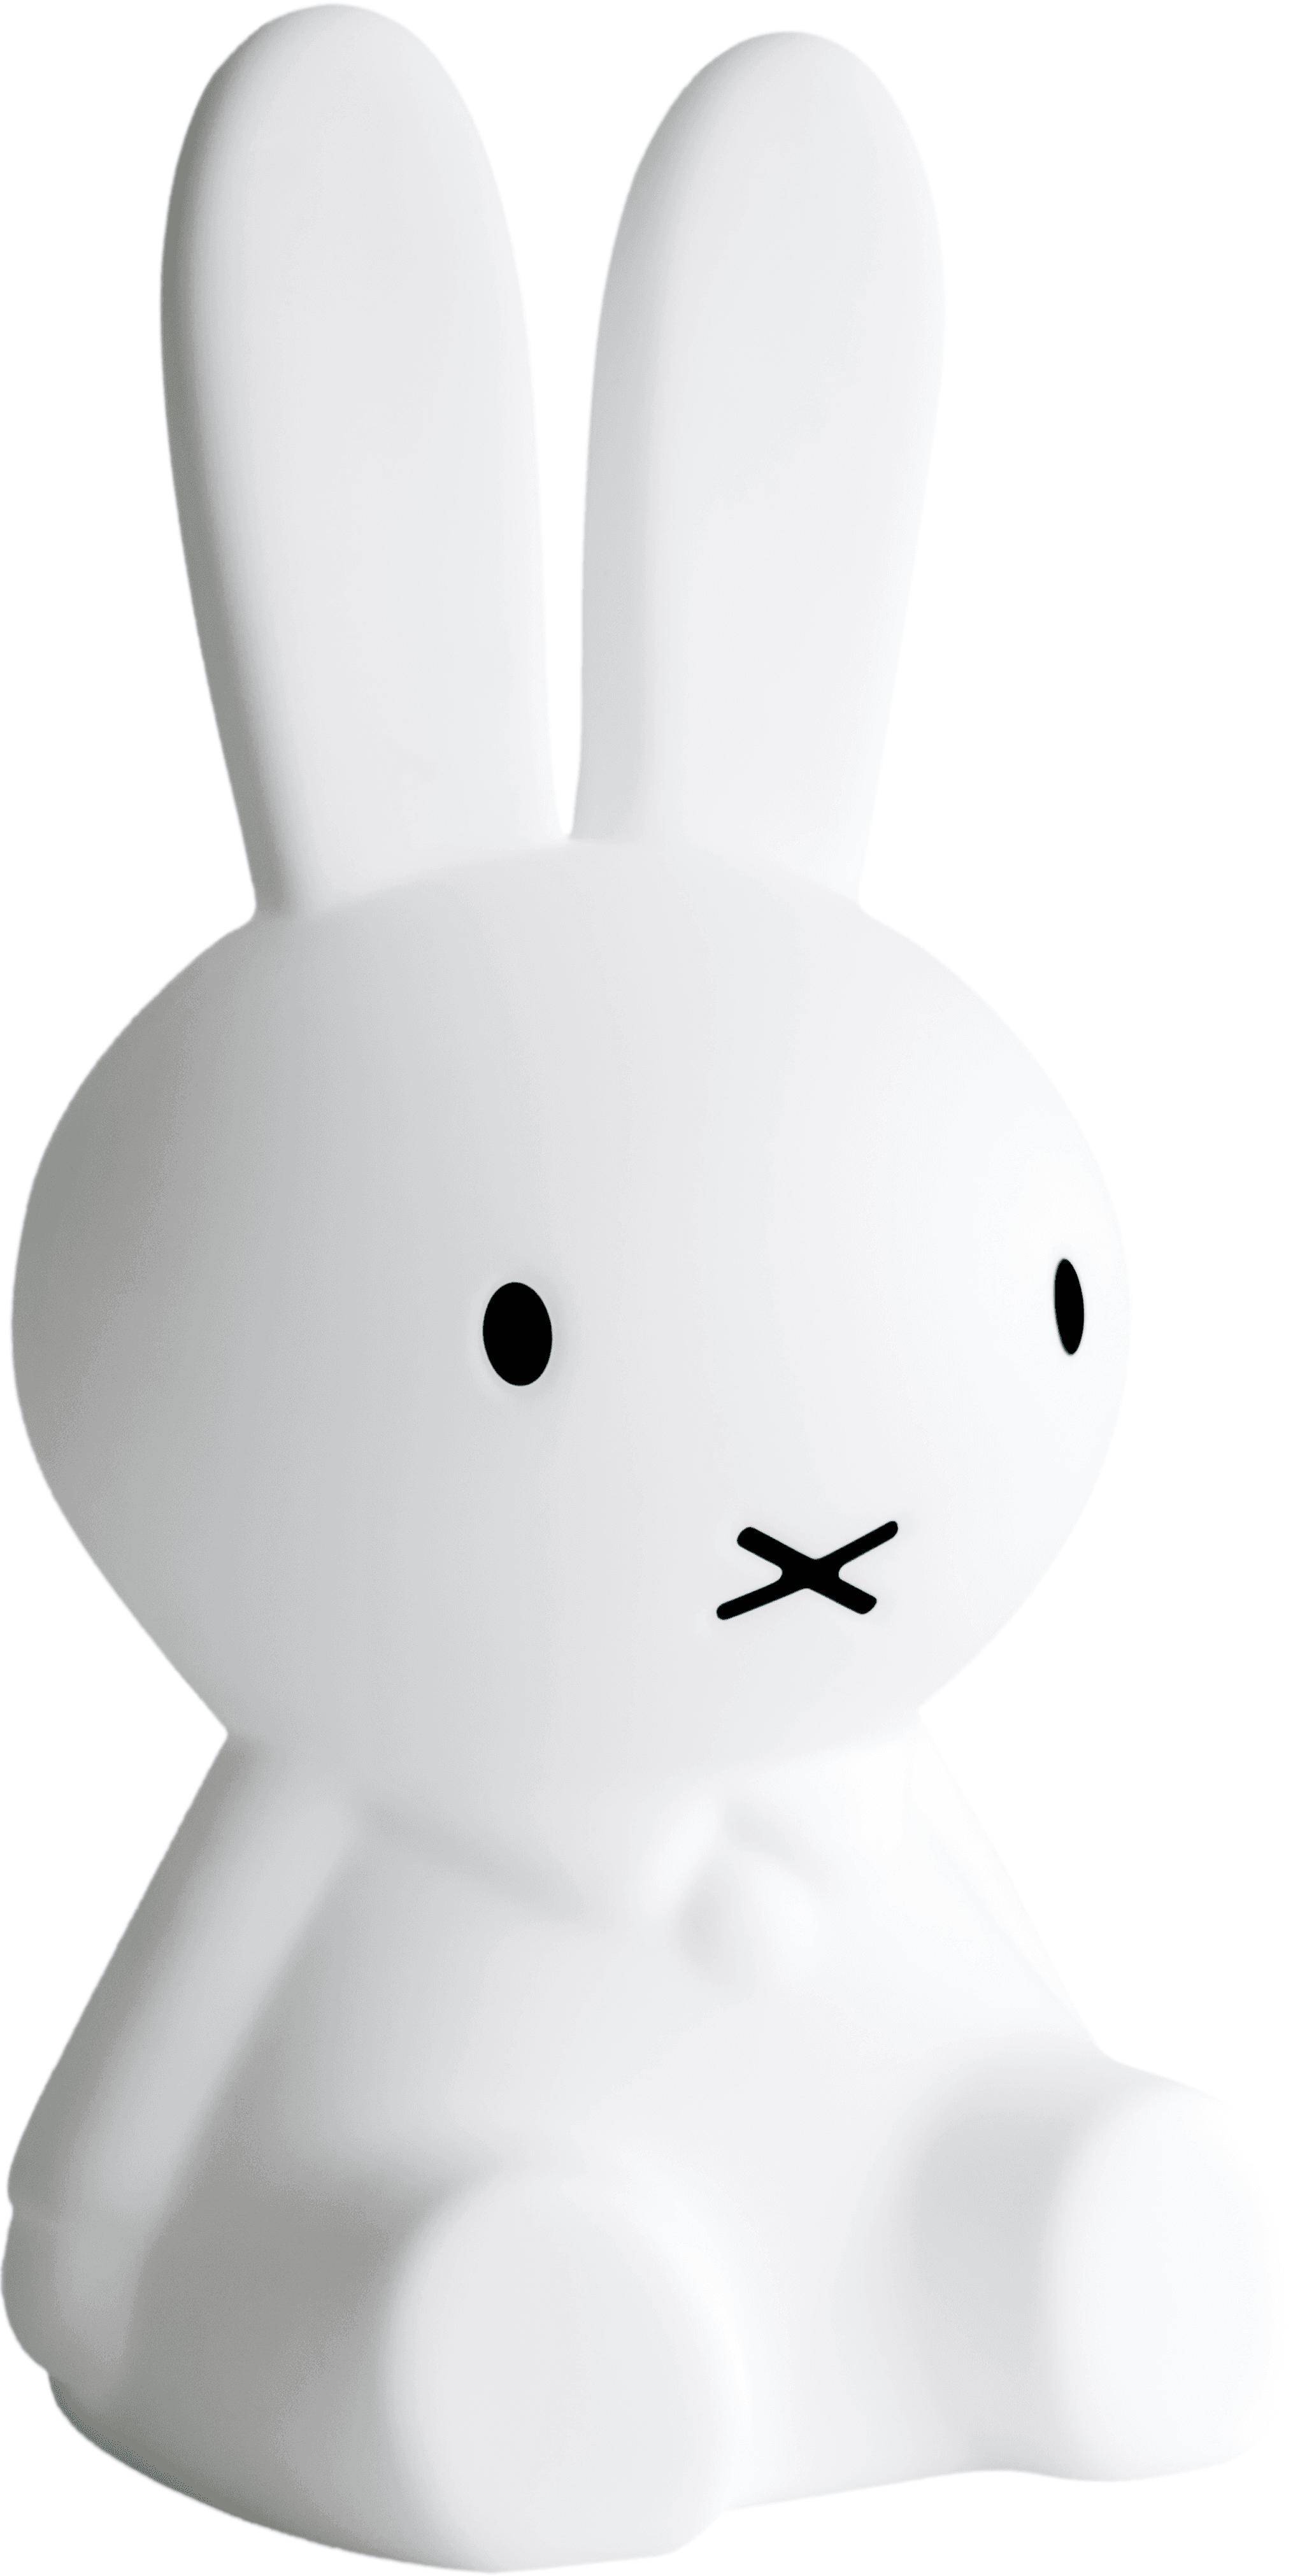 LED Bodenleuchte Miffy, Polyethylen, Weiß, 25 x 50 cm